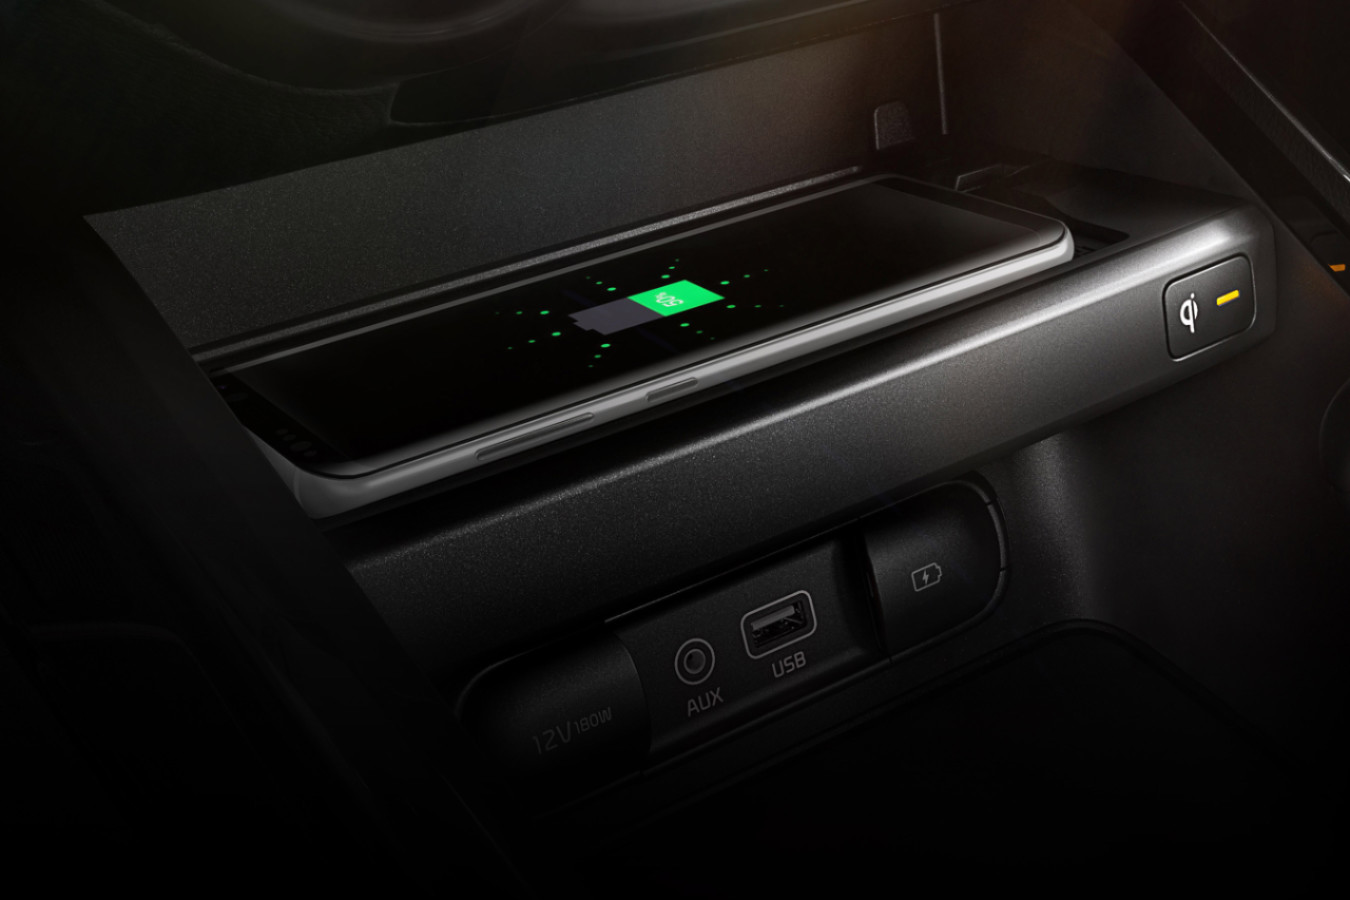 2020 Kia Forte Wireless Charger